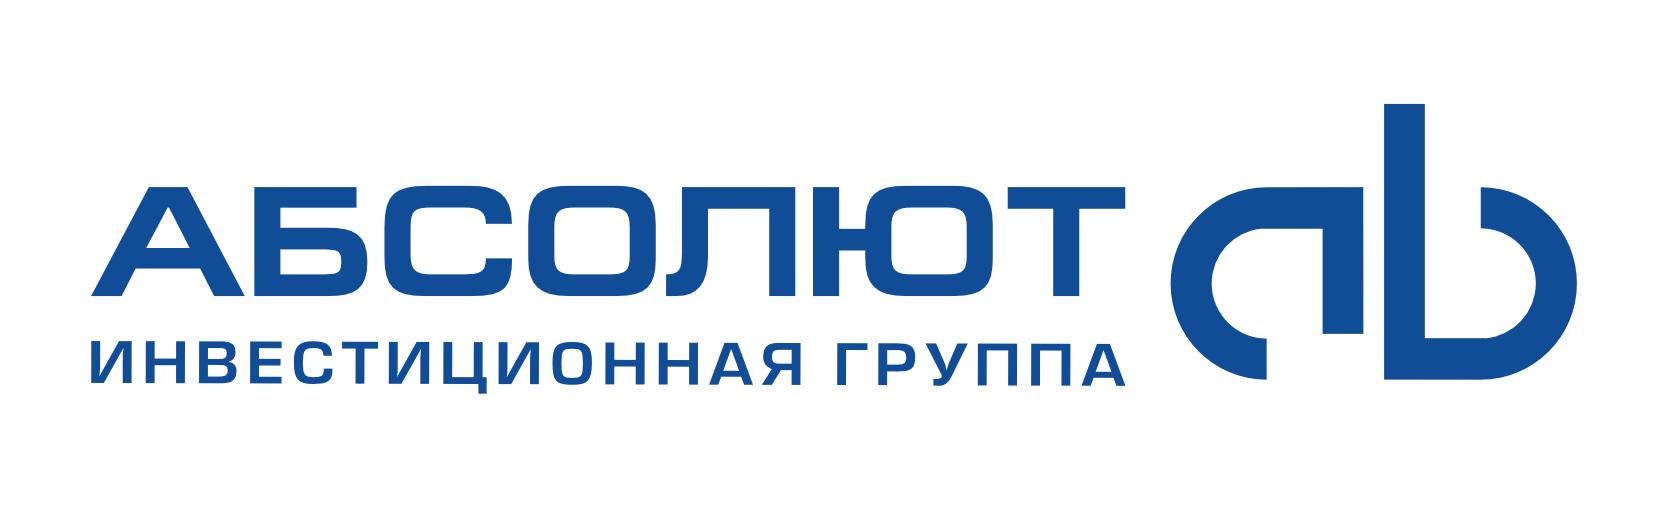 Инвестиционная группа АБСОЛЮТ